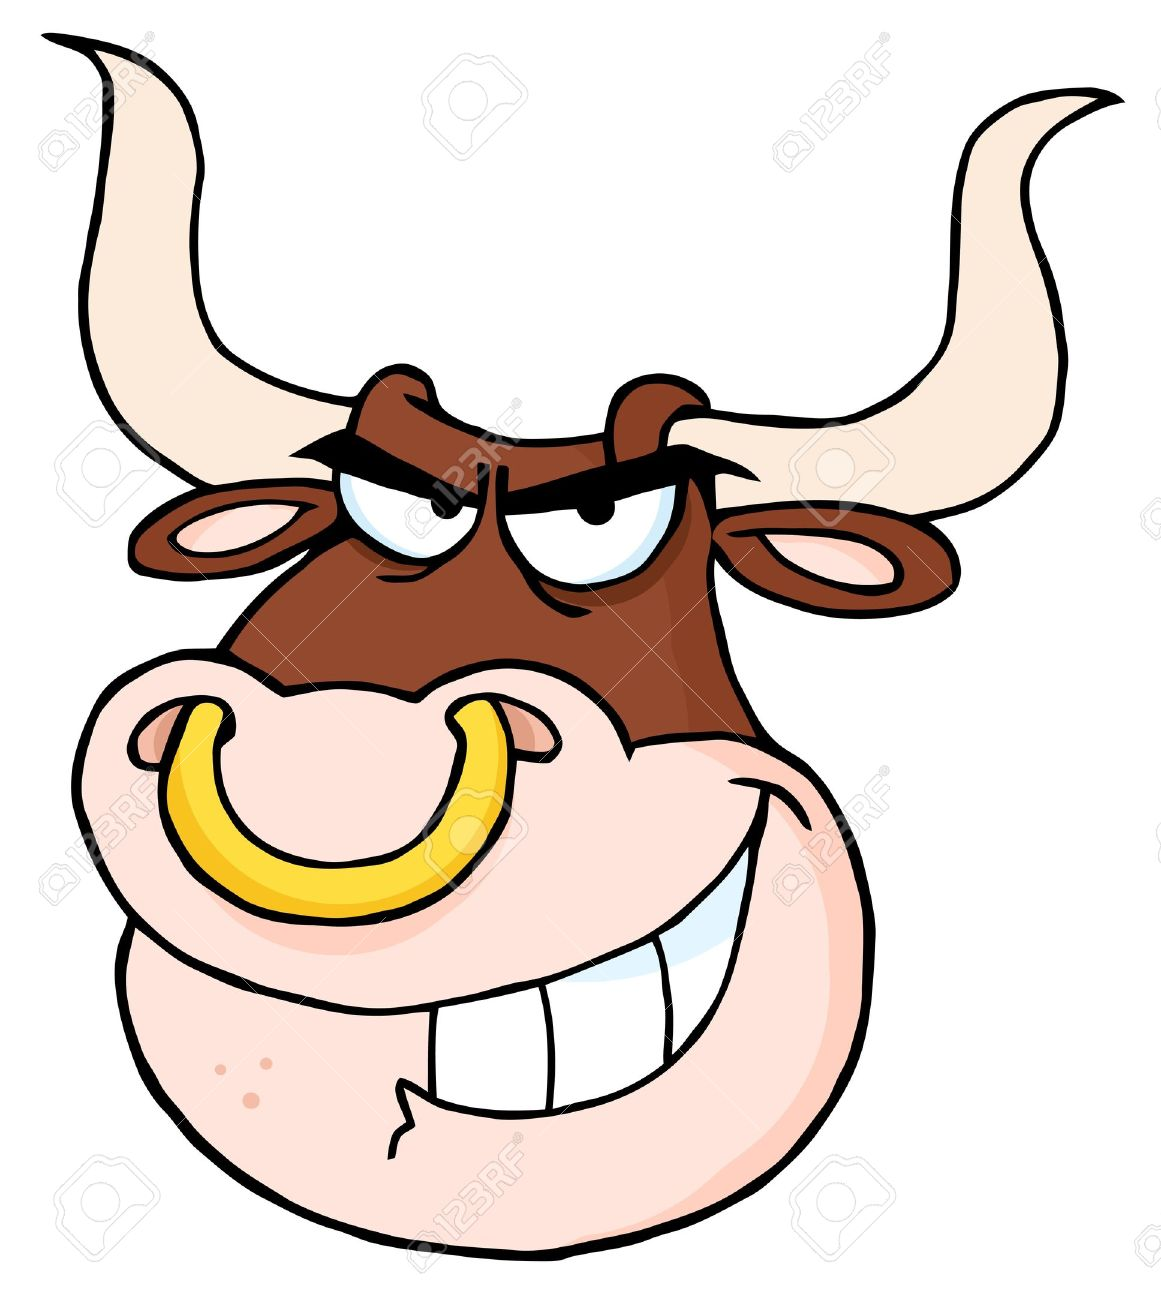 Angry Bull Head Cartoon Mascot Royalty Free Cliparts, Vectors, And ...